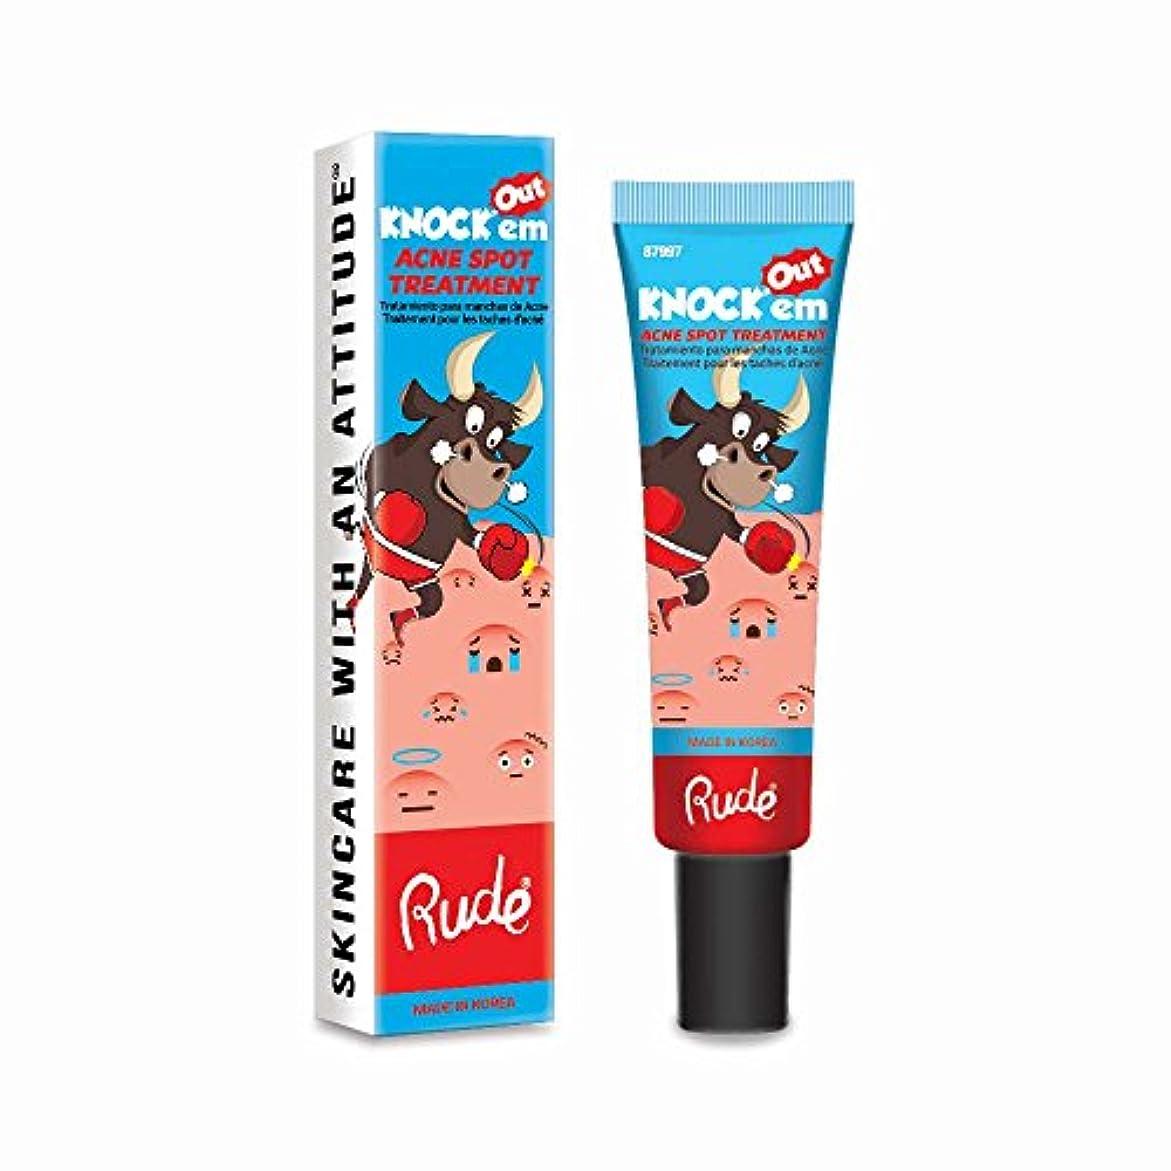 自己目的経済的(3 Pack) RUDE Knock'em Acne Spot Treatment (並行輸入品)